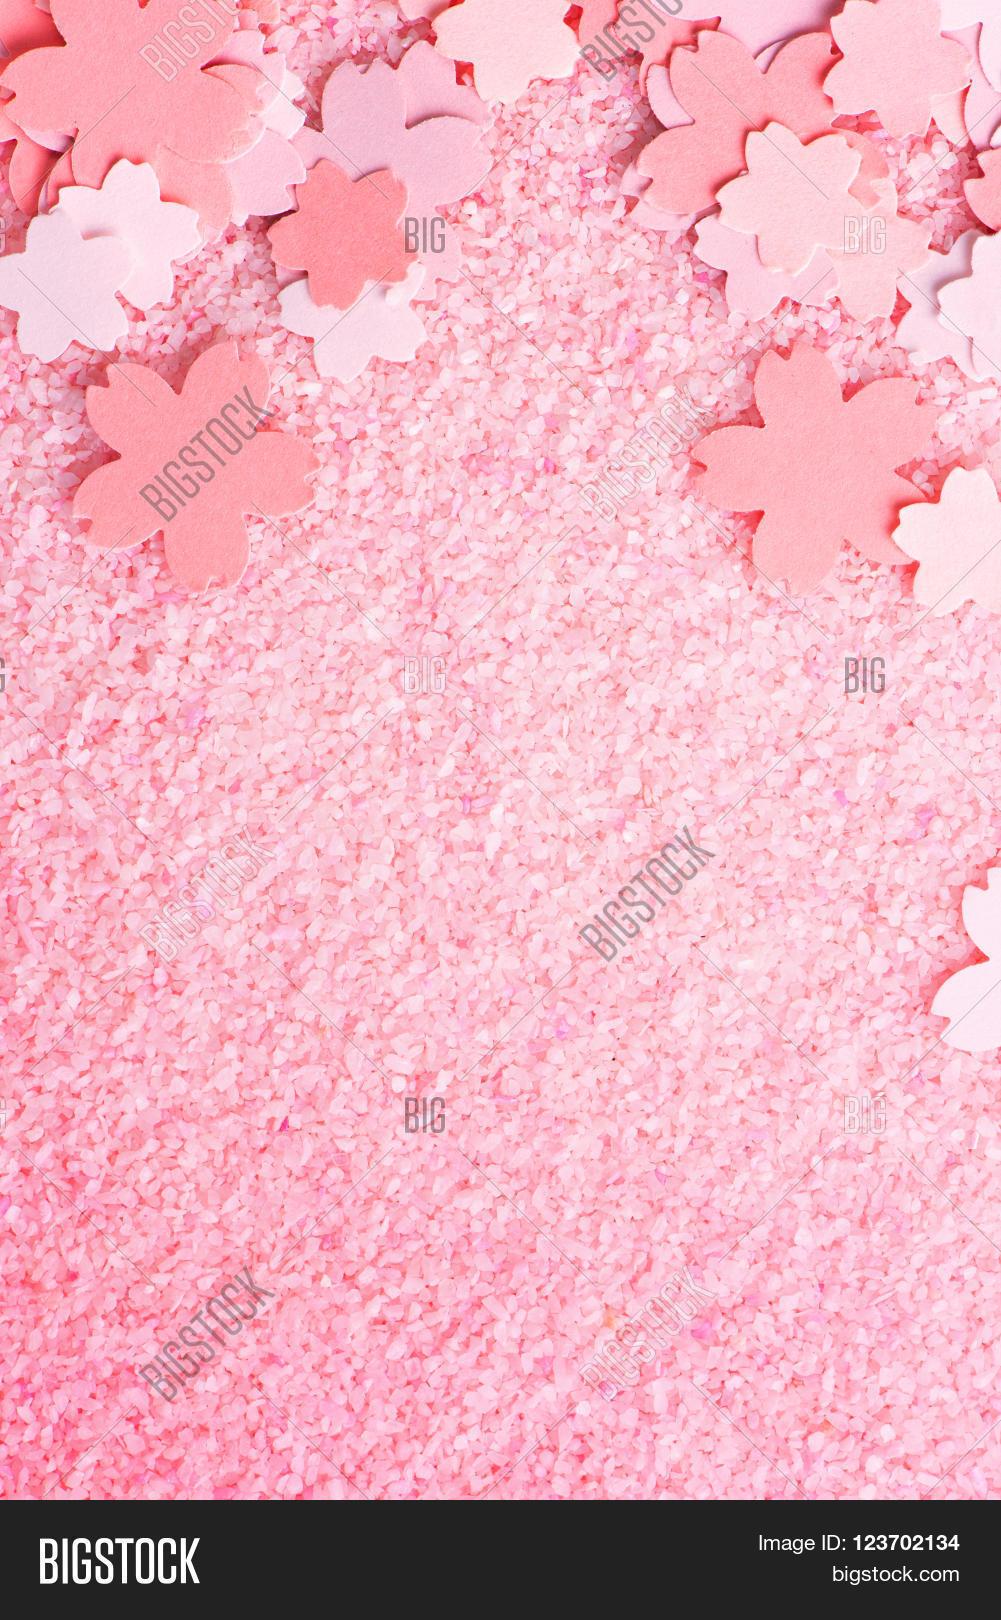 Cherry Blossom Image Photo Free Trial Bigstock